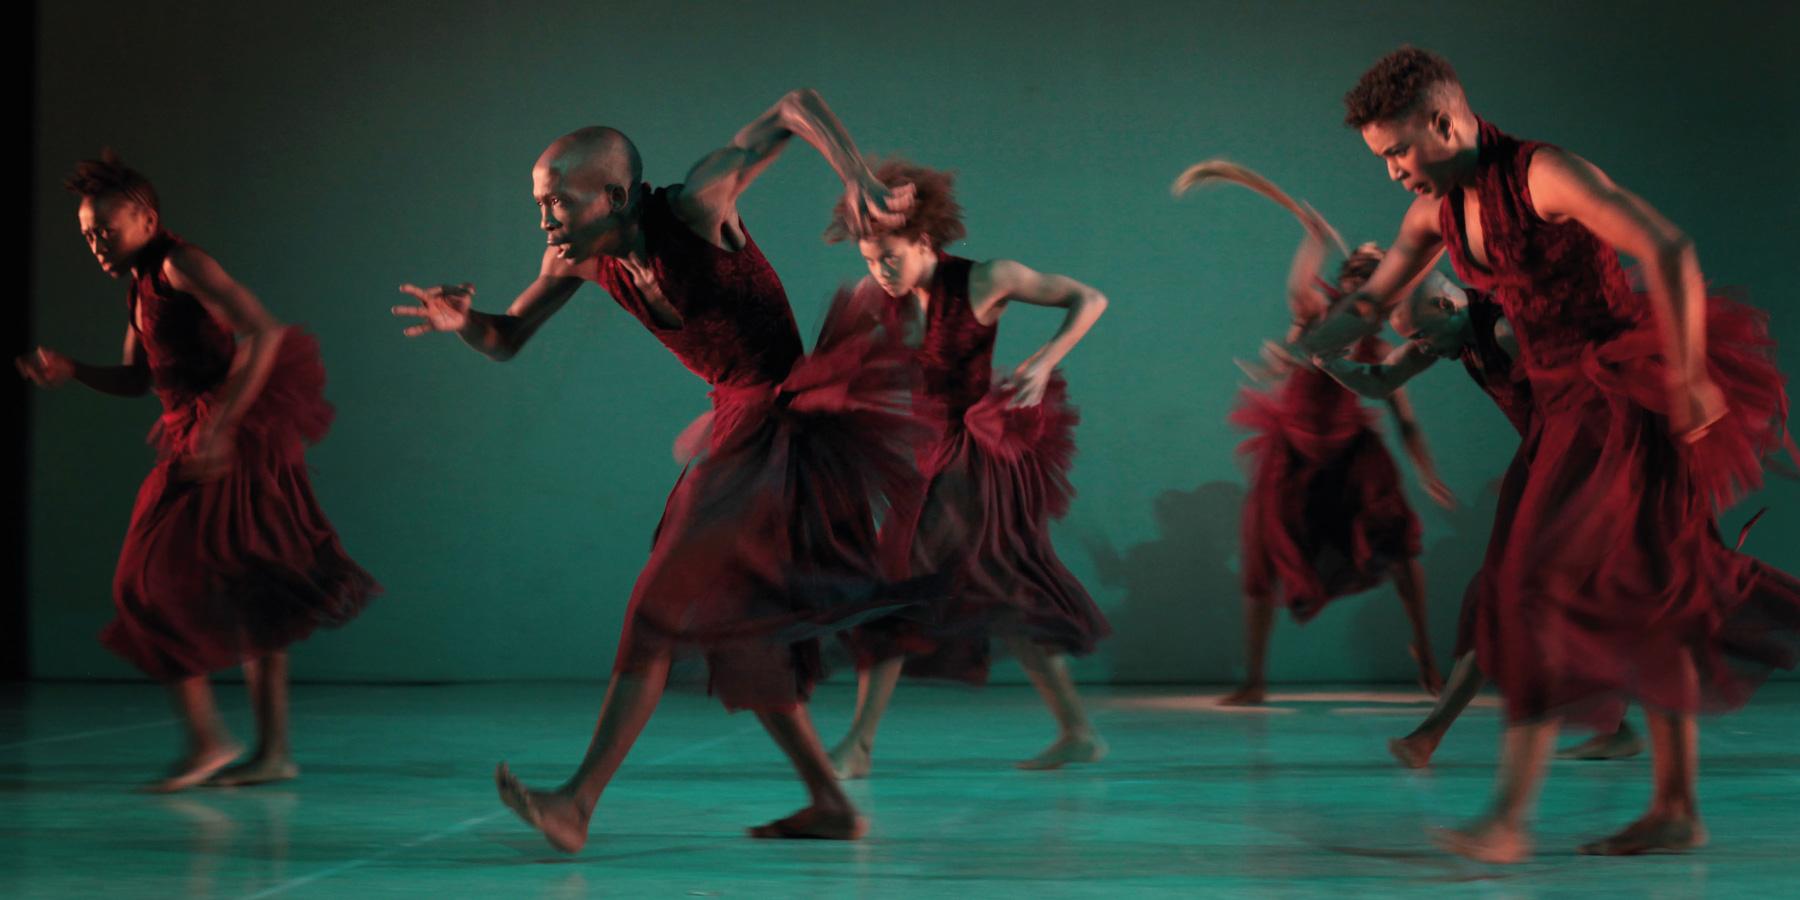 ballet performers, Dada Masilo's Giselle